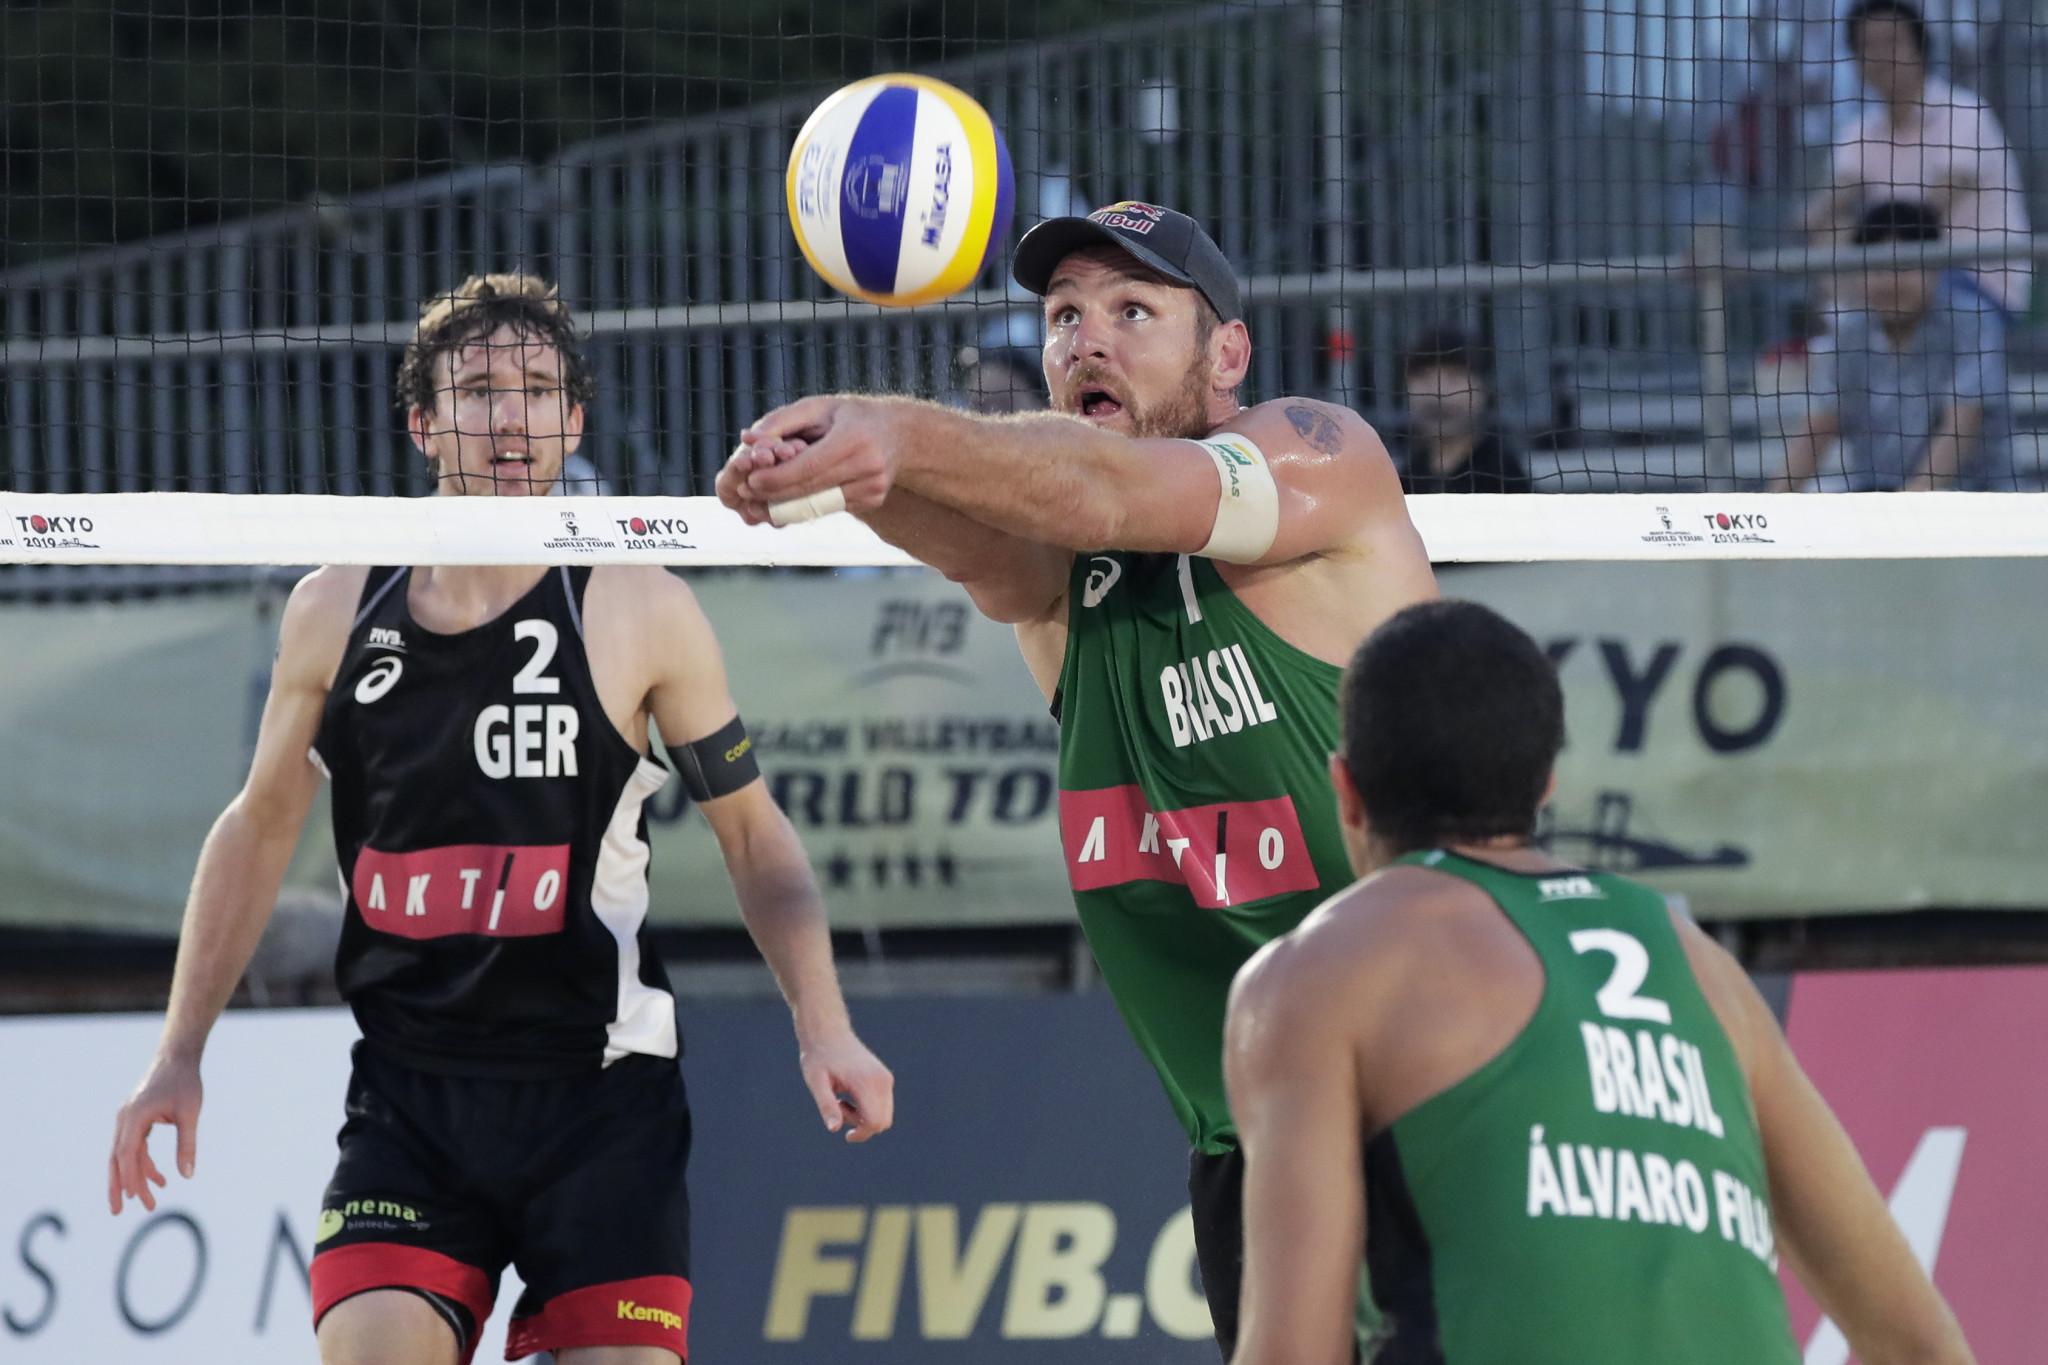 Alison Cerutti and Alvaro Filho are through to the quarter-finals of the men's tournament ©Getty Images